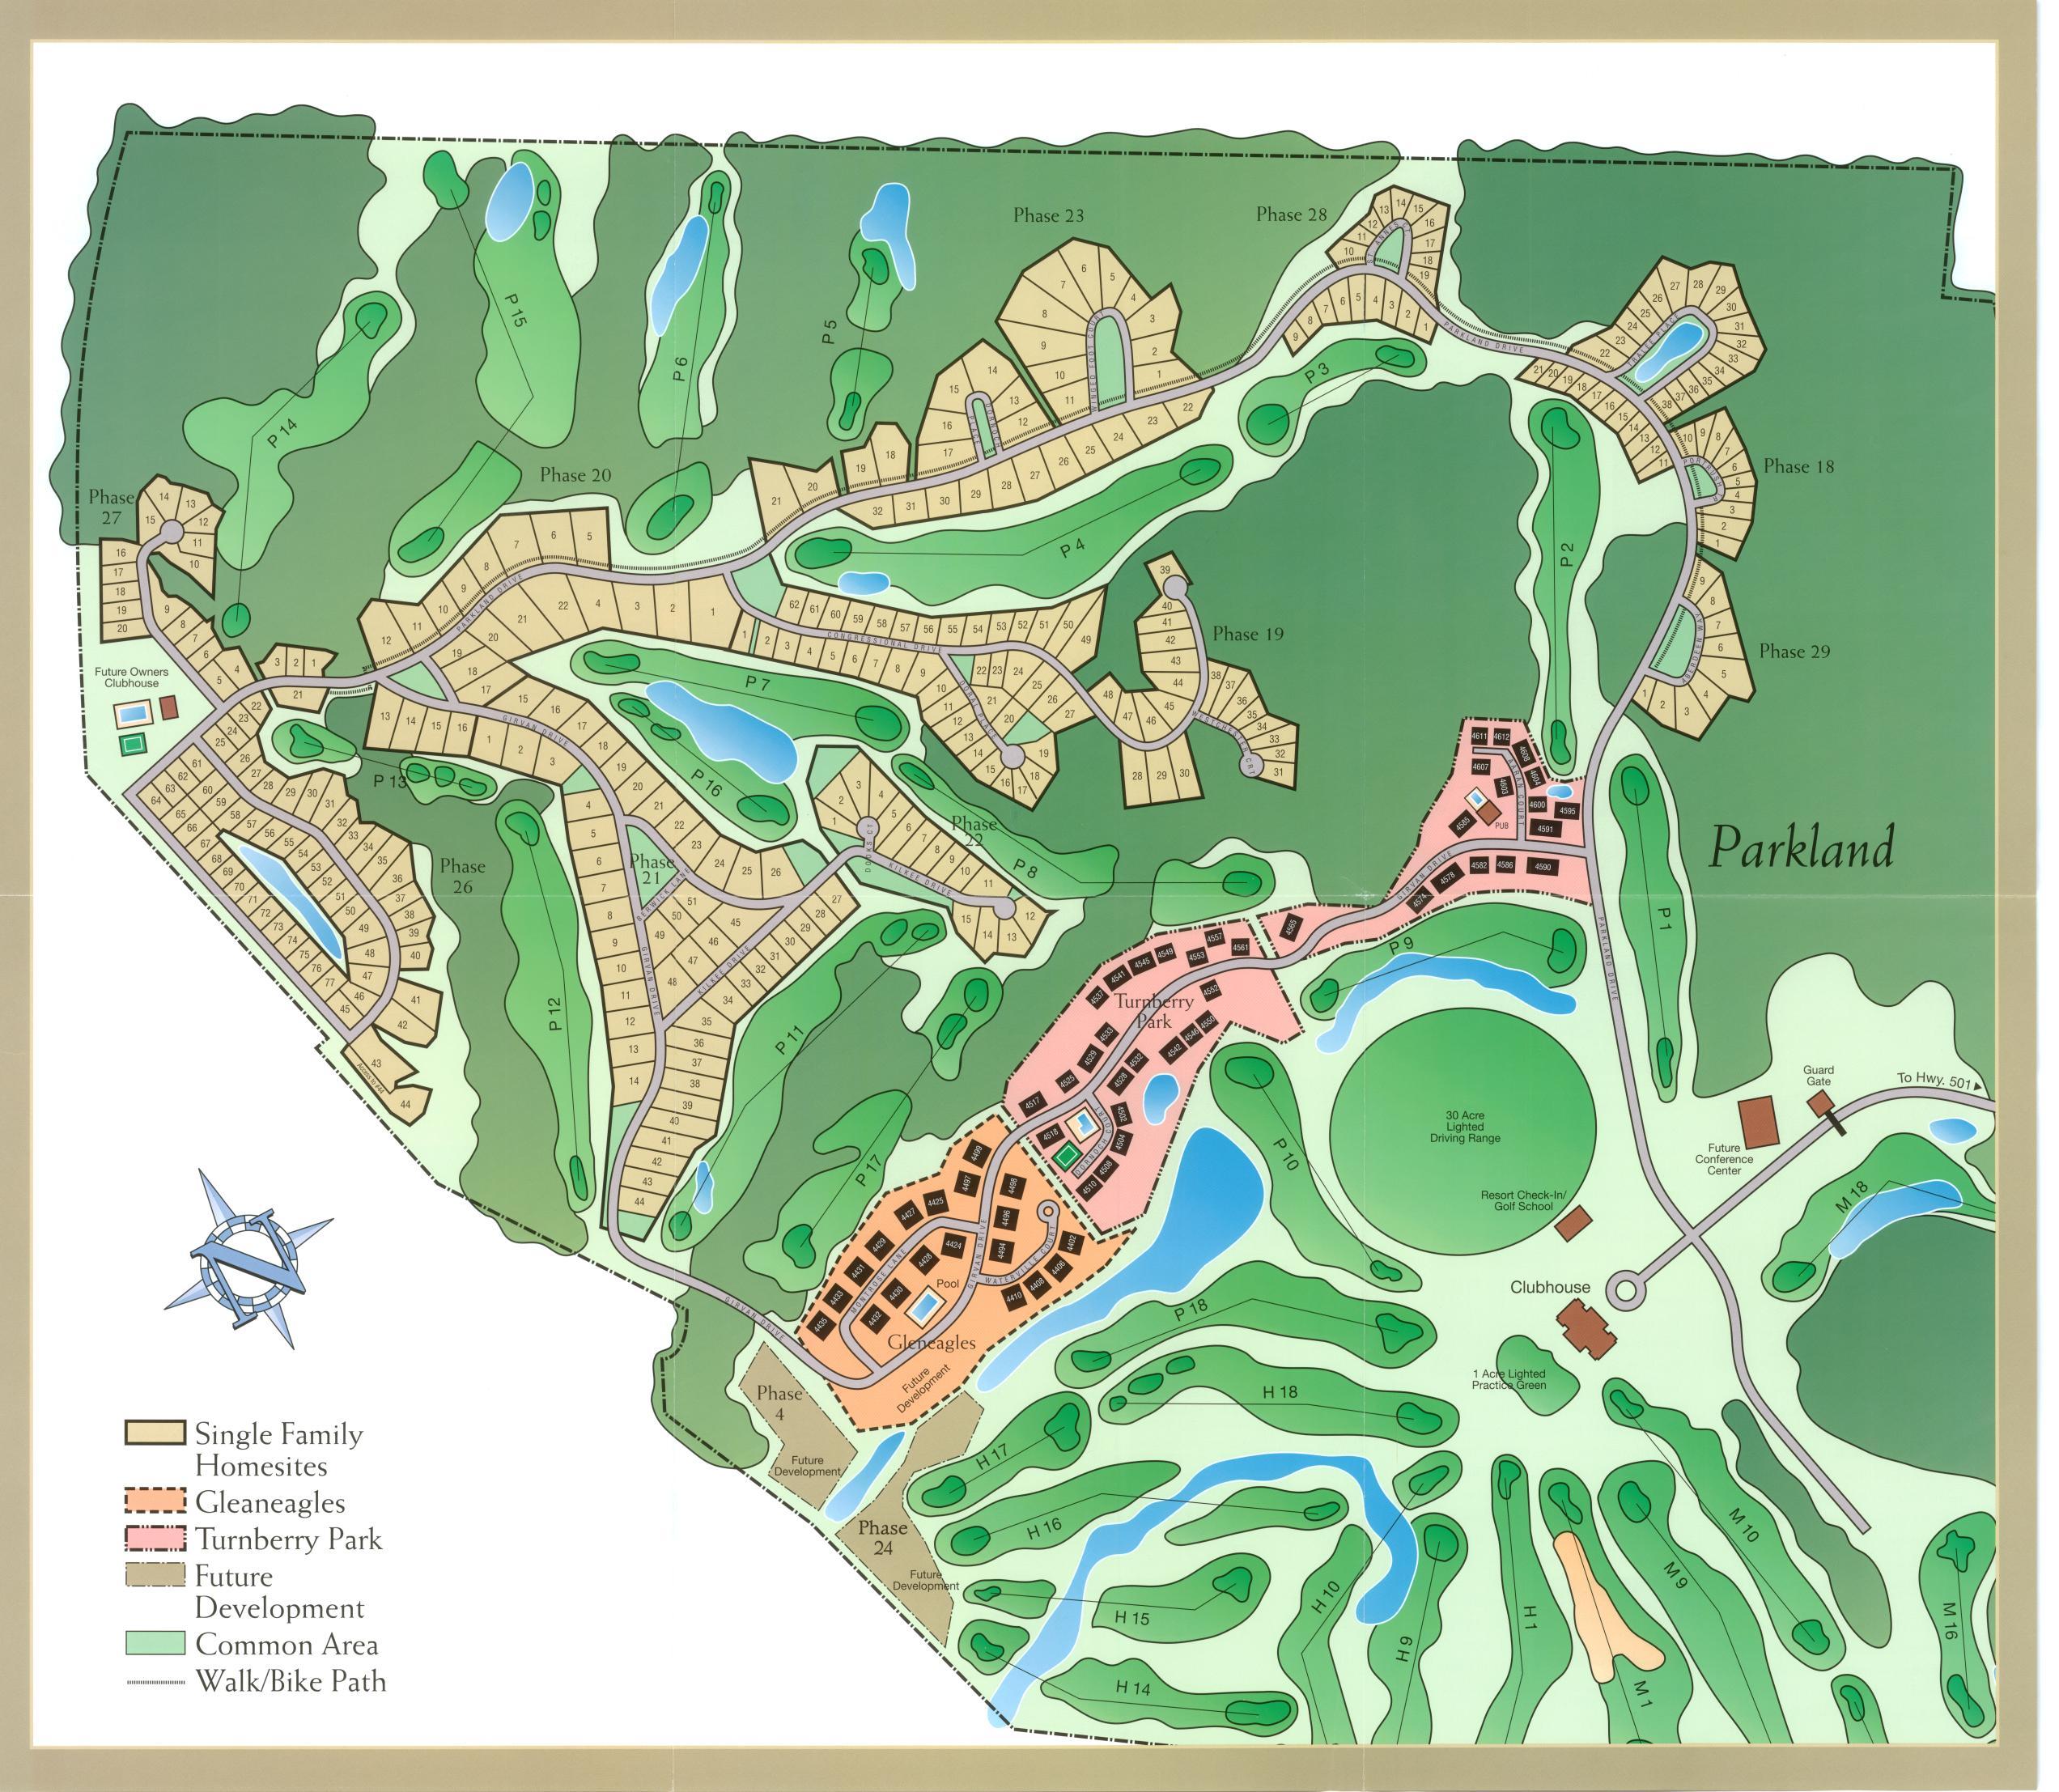 Wild Dunes Resort Map. Image Provided By Wild Dunes Resort With Wild ...